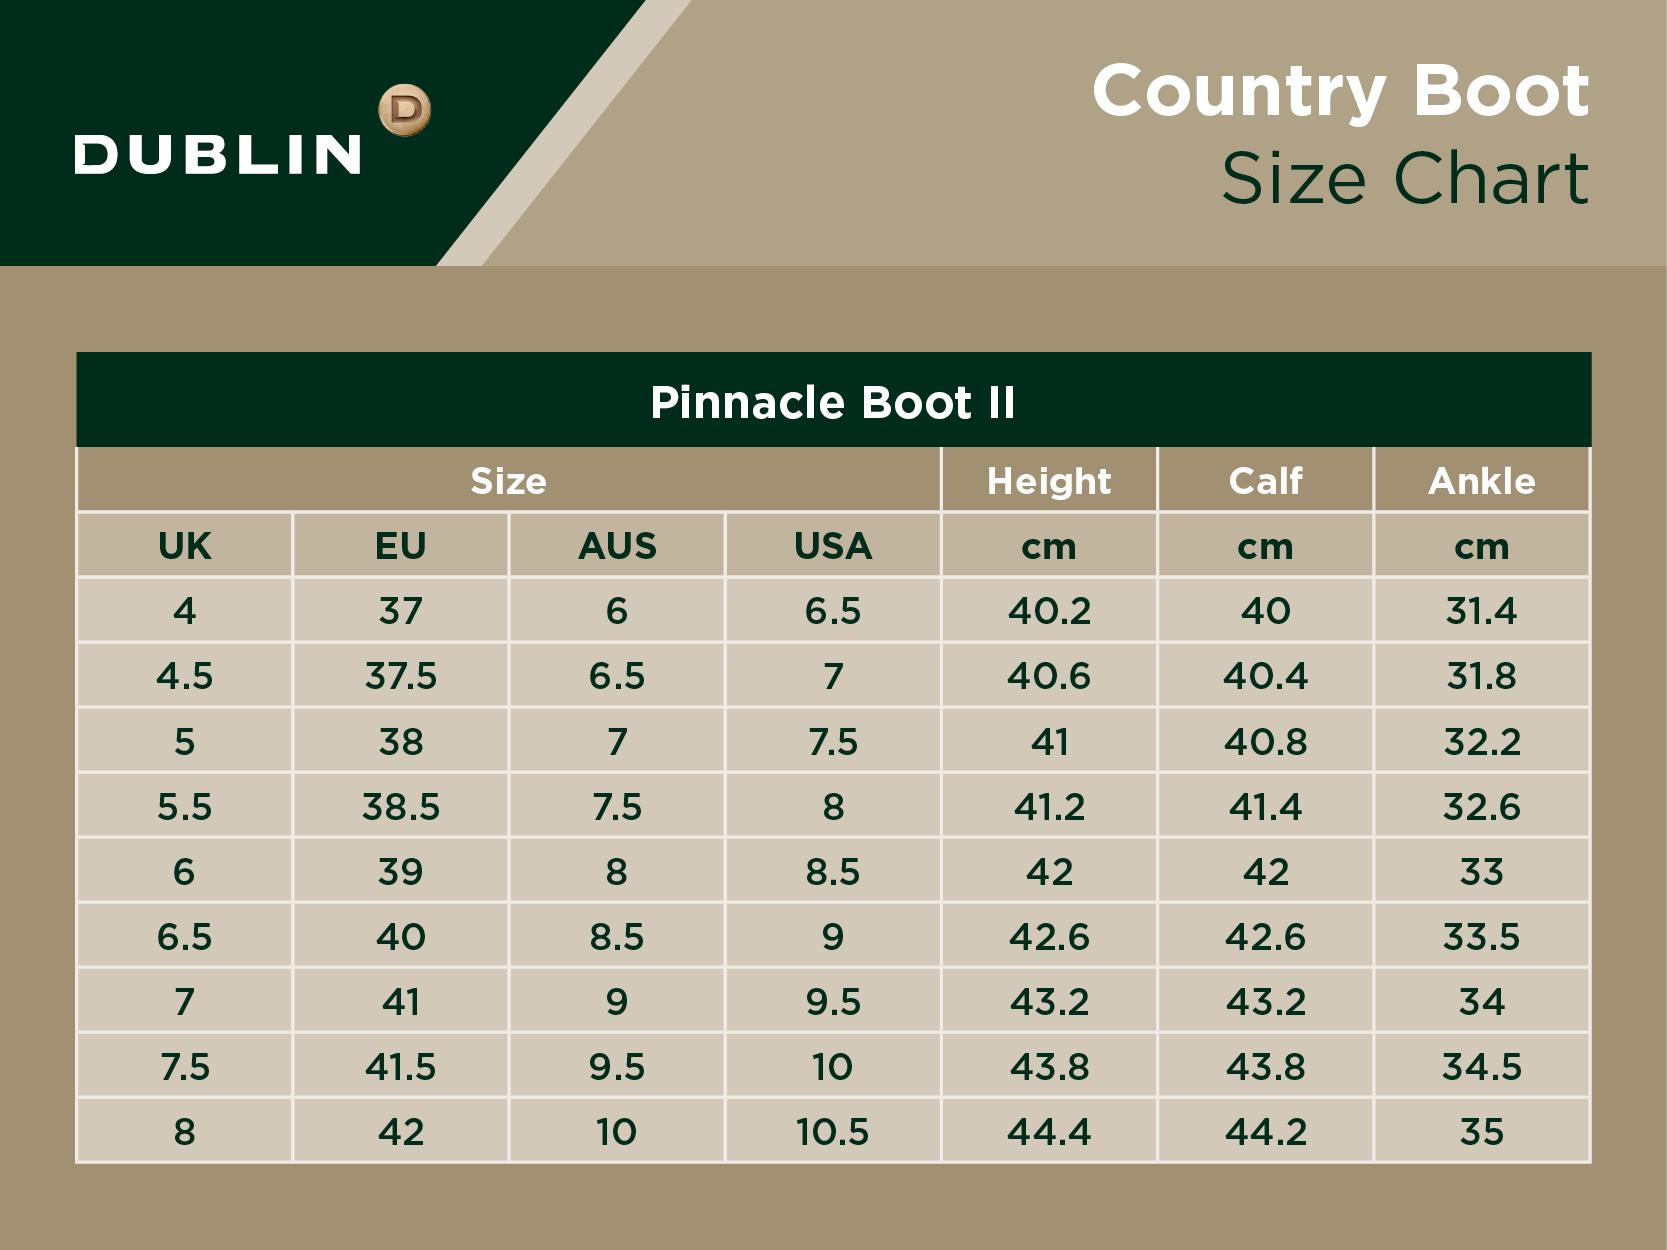 Pinnacle Boot II Size Chart